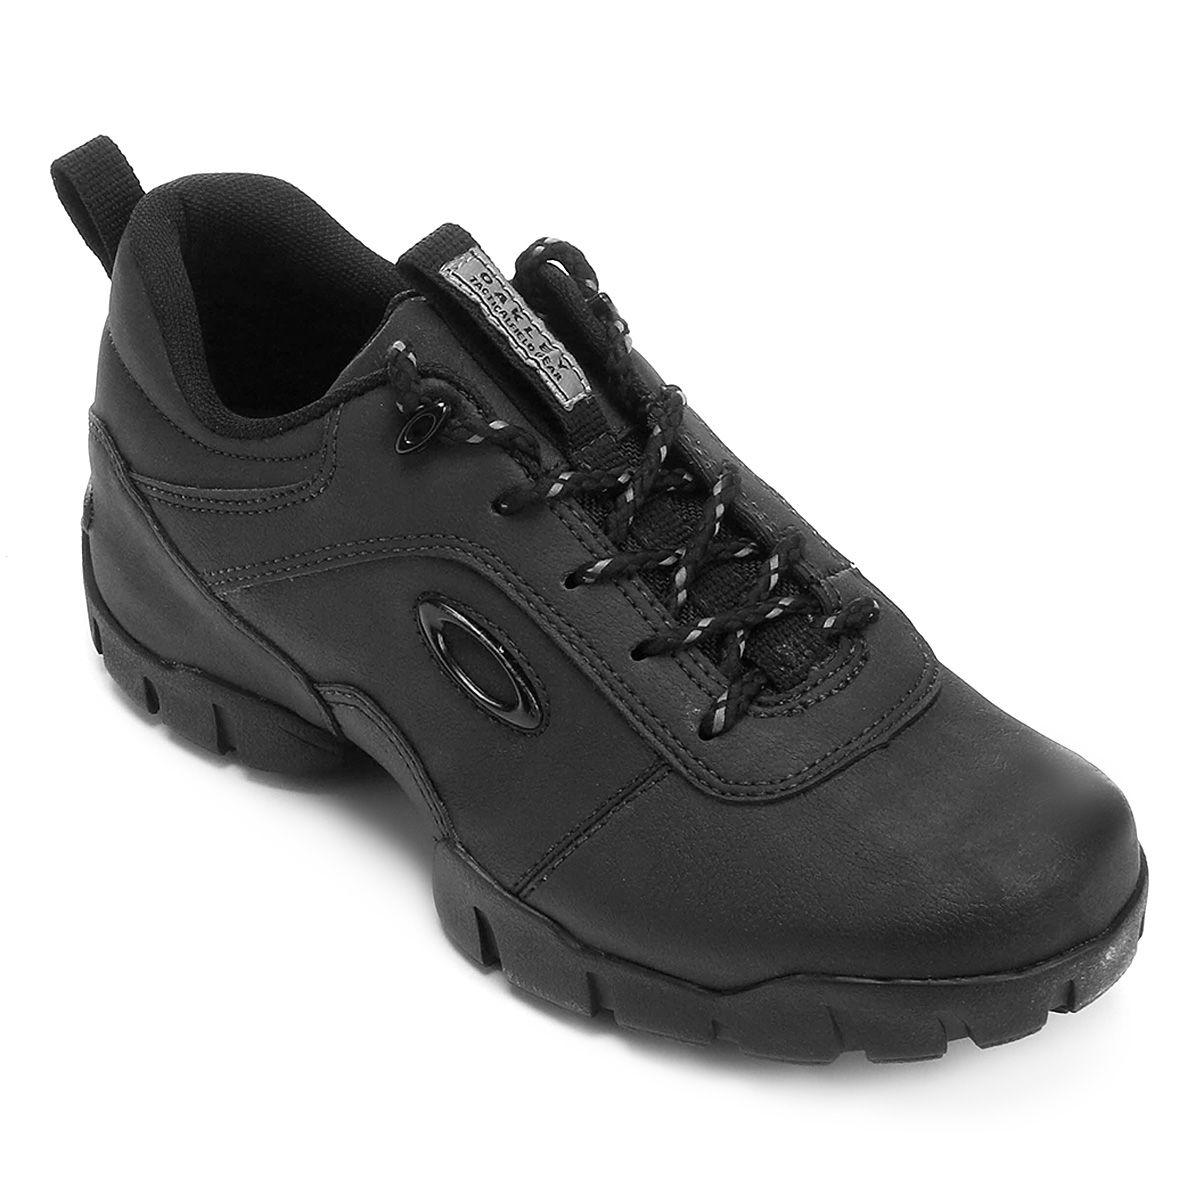 e0b795474c7 3e8e271f9c81eb  Tênis Couro Oakley Enduro Masculino - Compre Agora Netshoes  joao ... bbc5e3804226fe ...